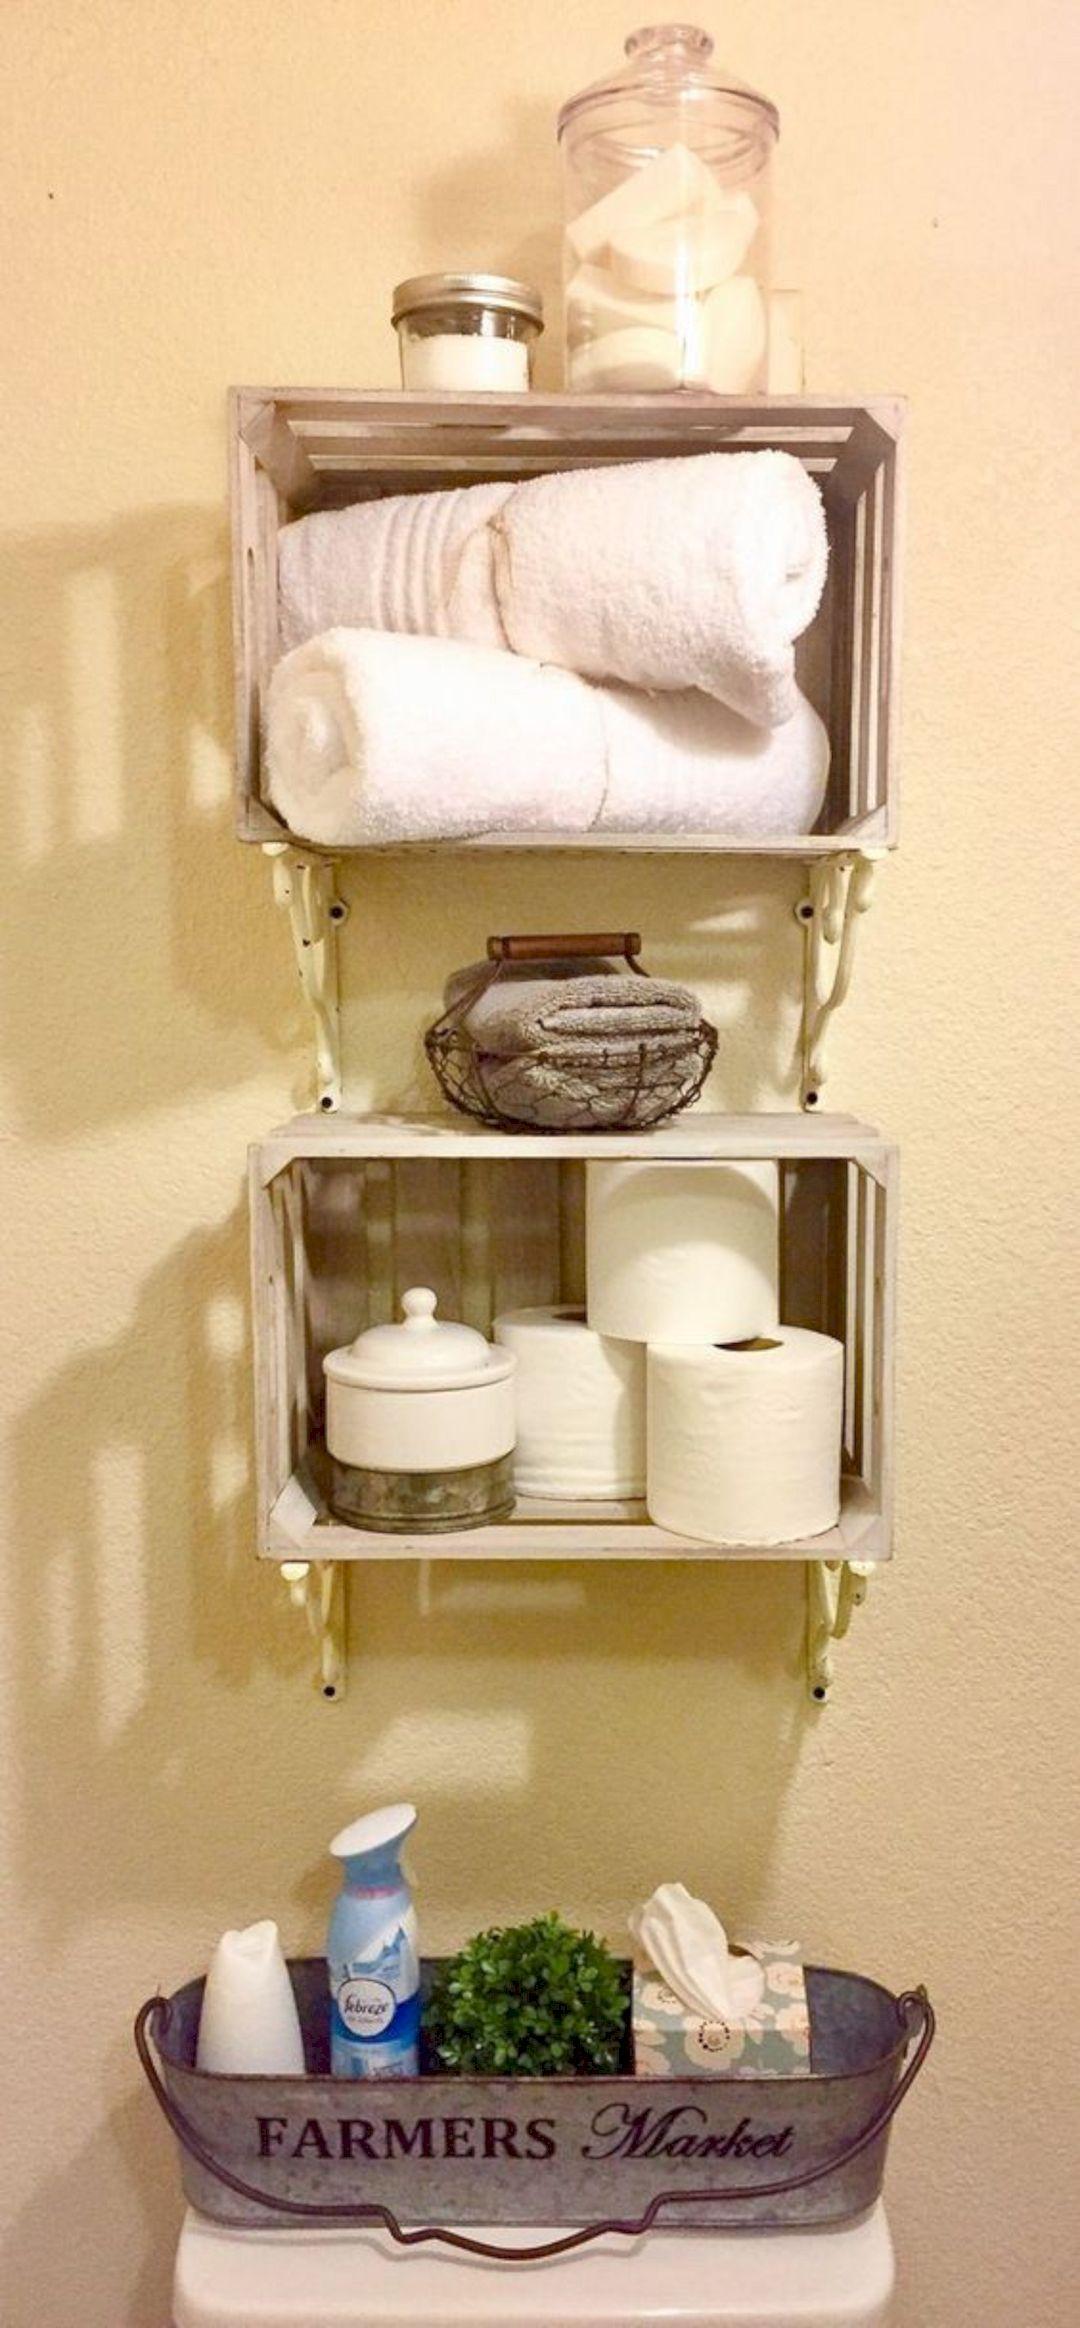 15 Bright Storage Ideas To Keep Your Bathroom Organized Rustic